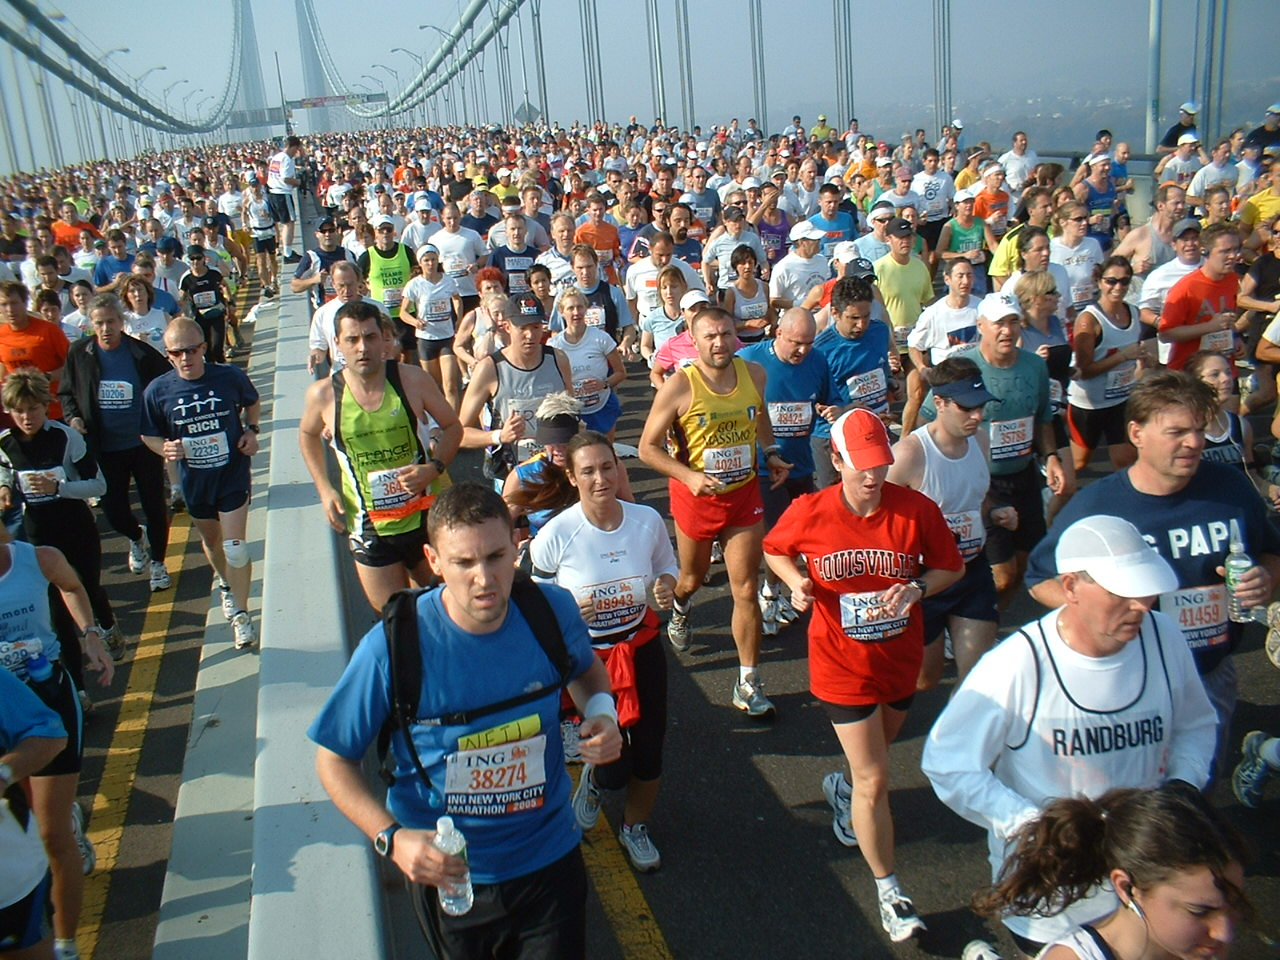 Verrazano Bridge, NYC Marathon